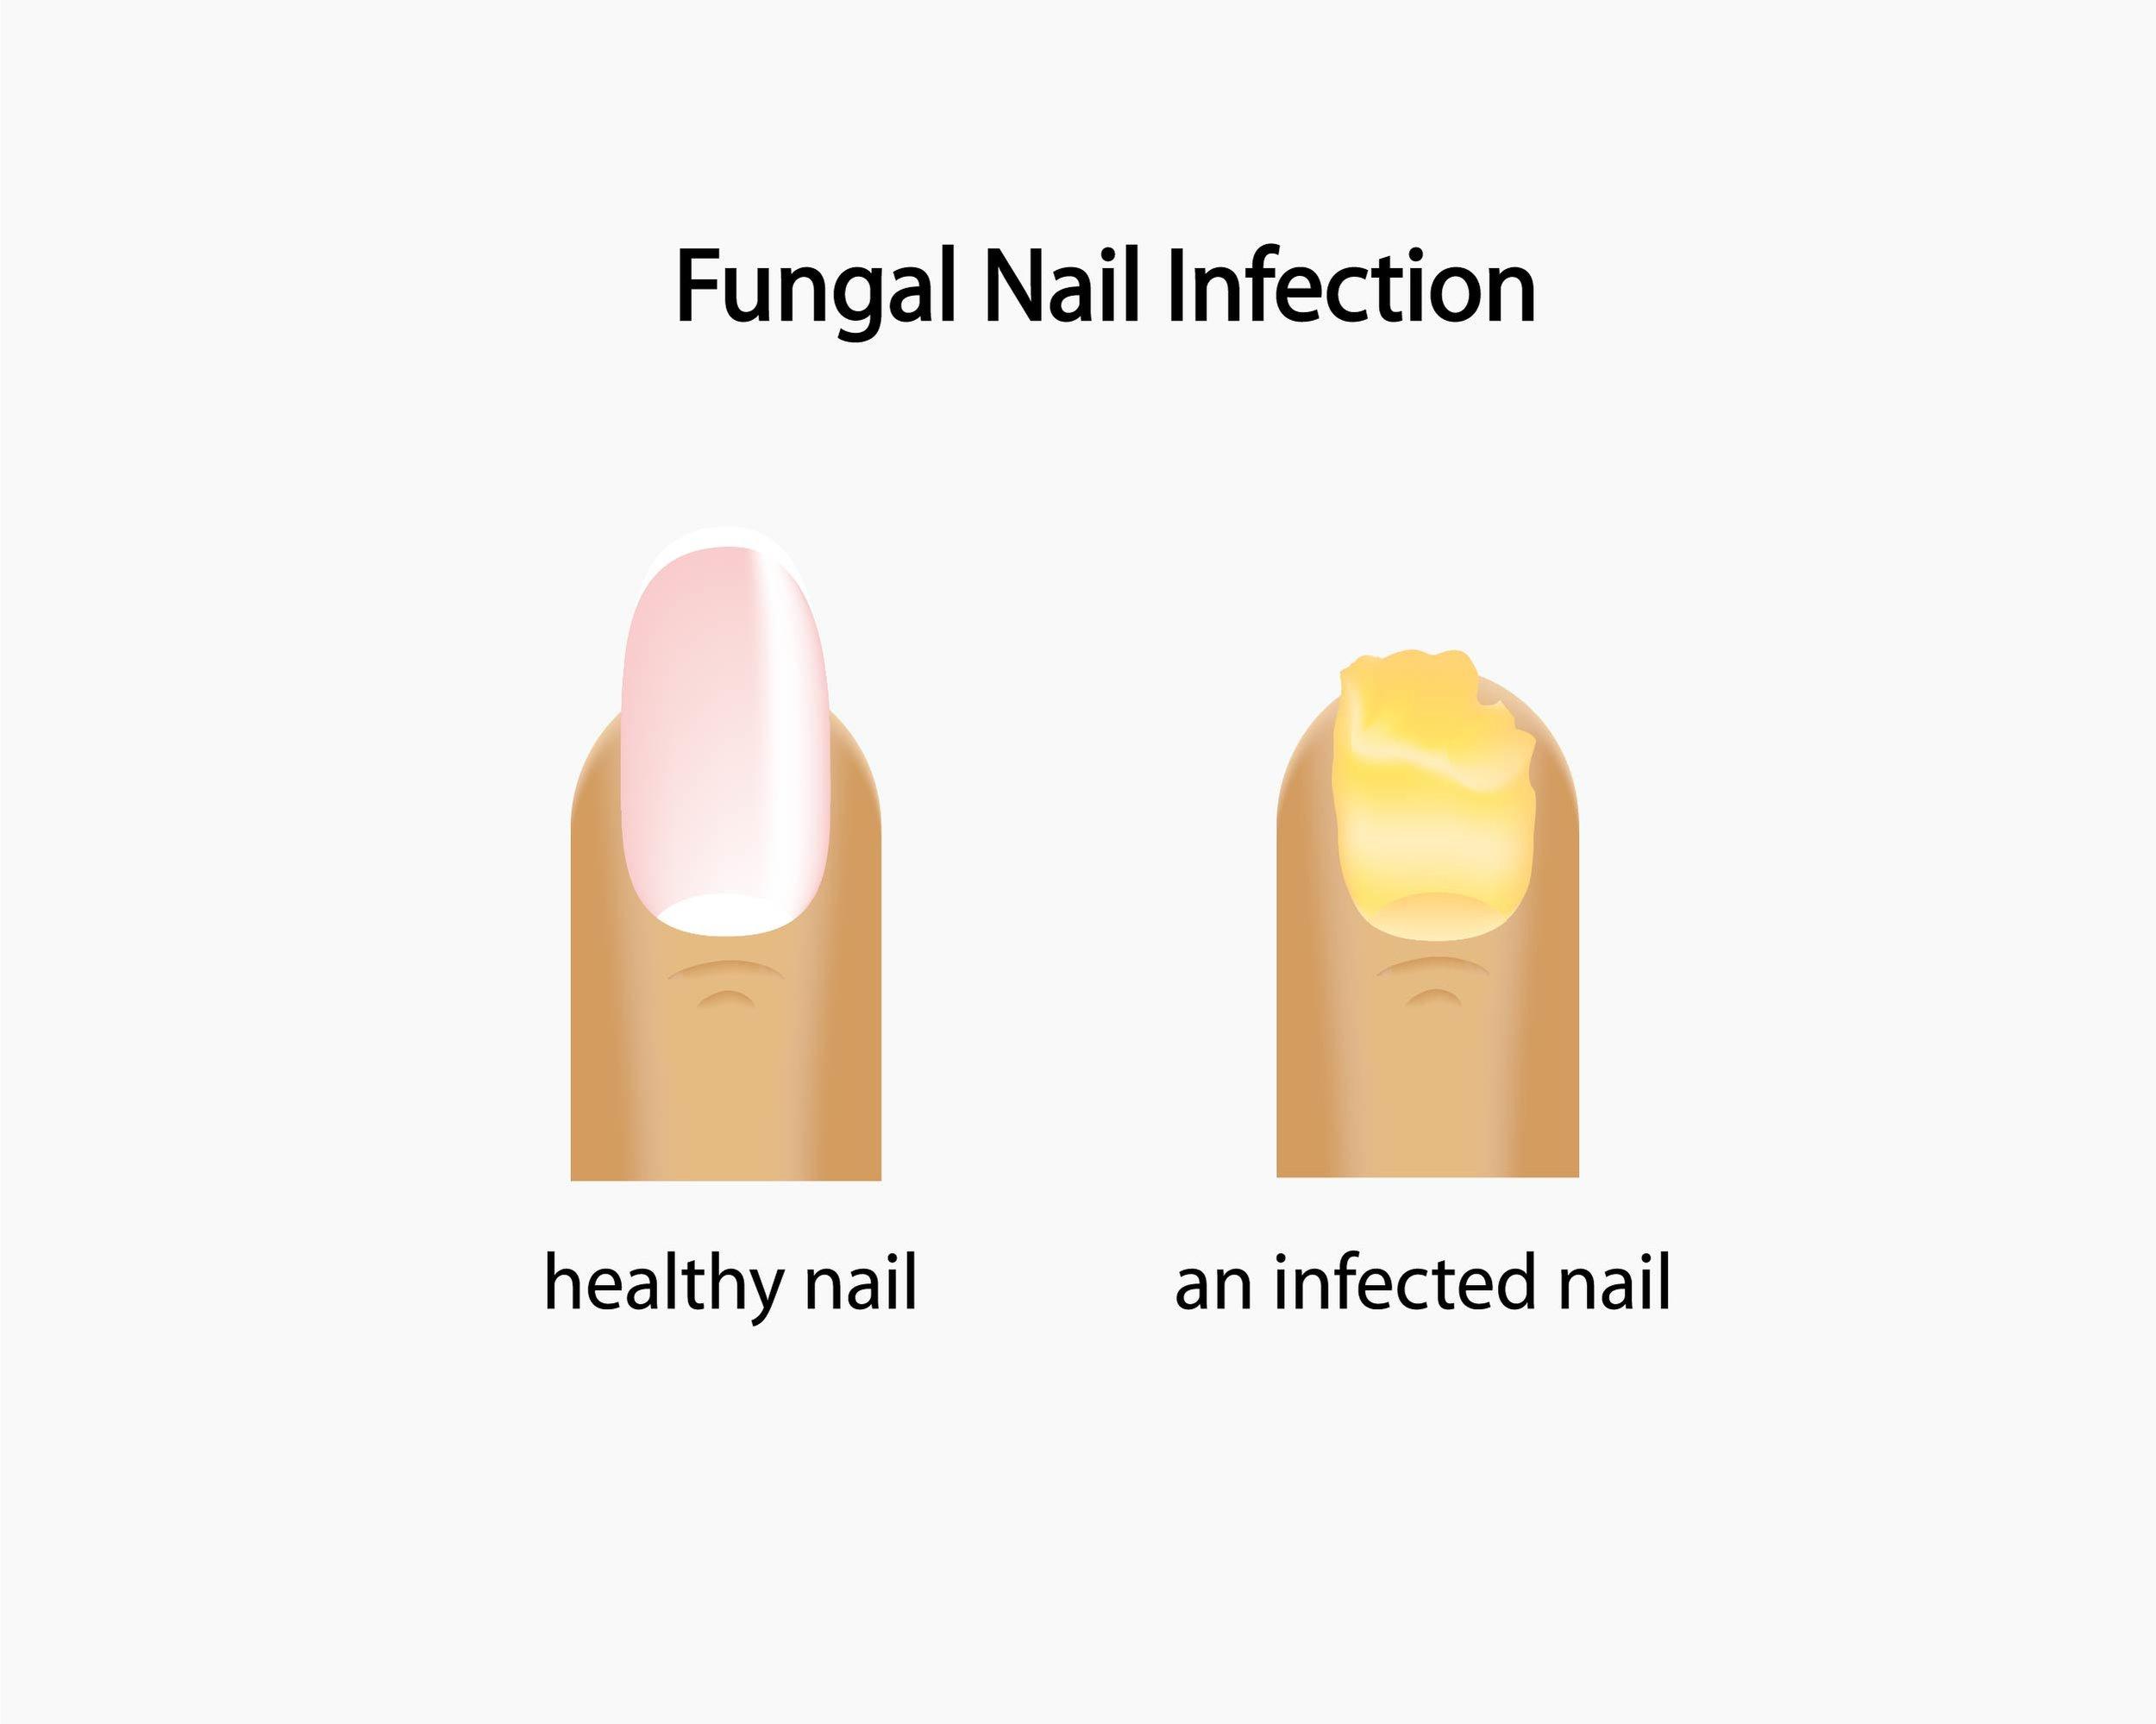 laser-fungal-nails-union-city-fairview-nj-doctor